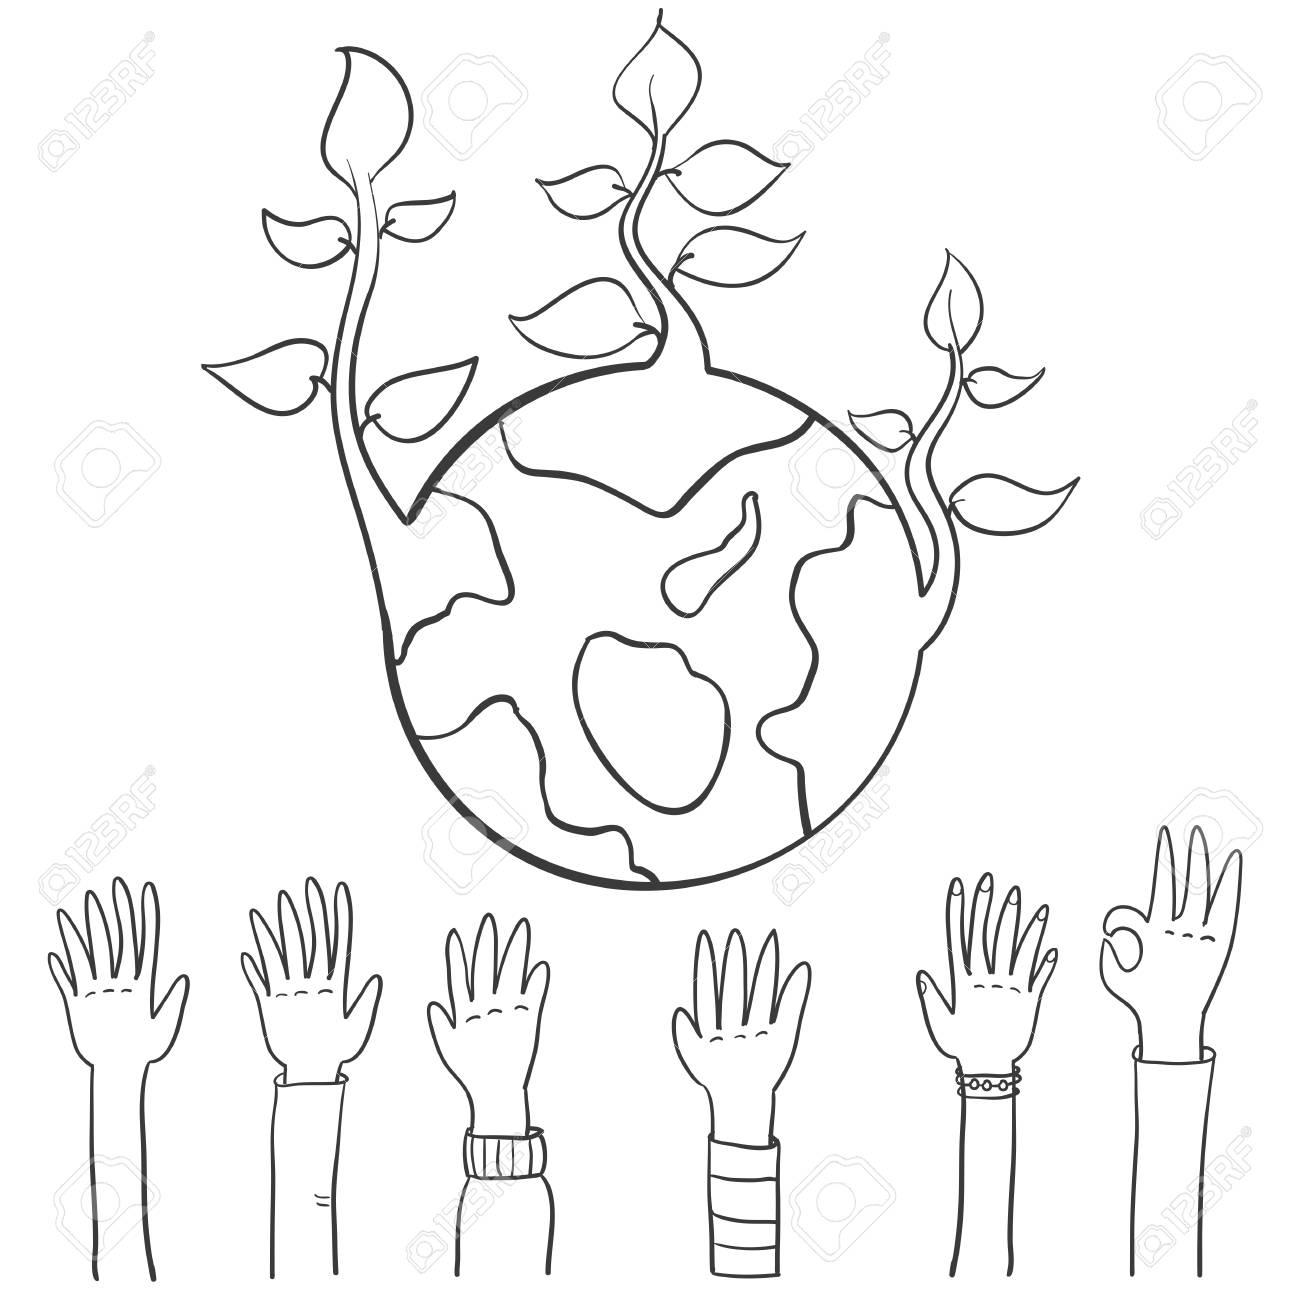 World Hand Draw Earth Day Vector Illustration